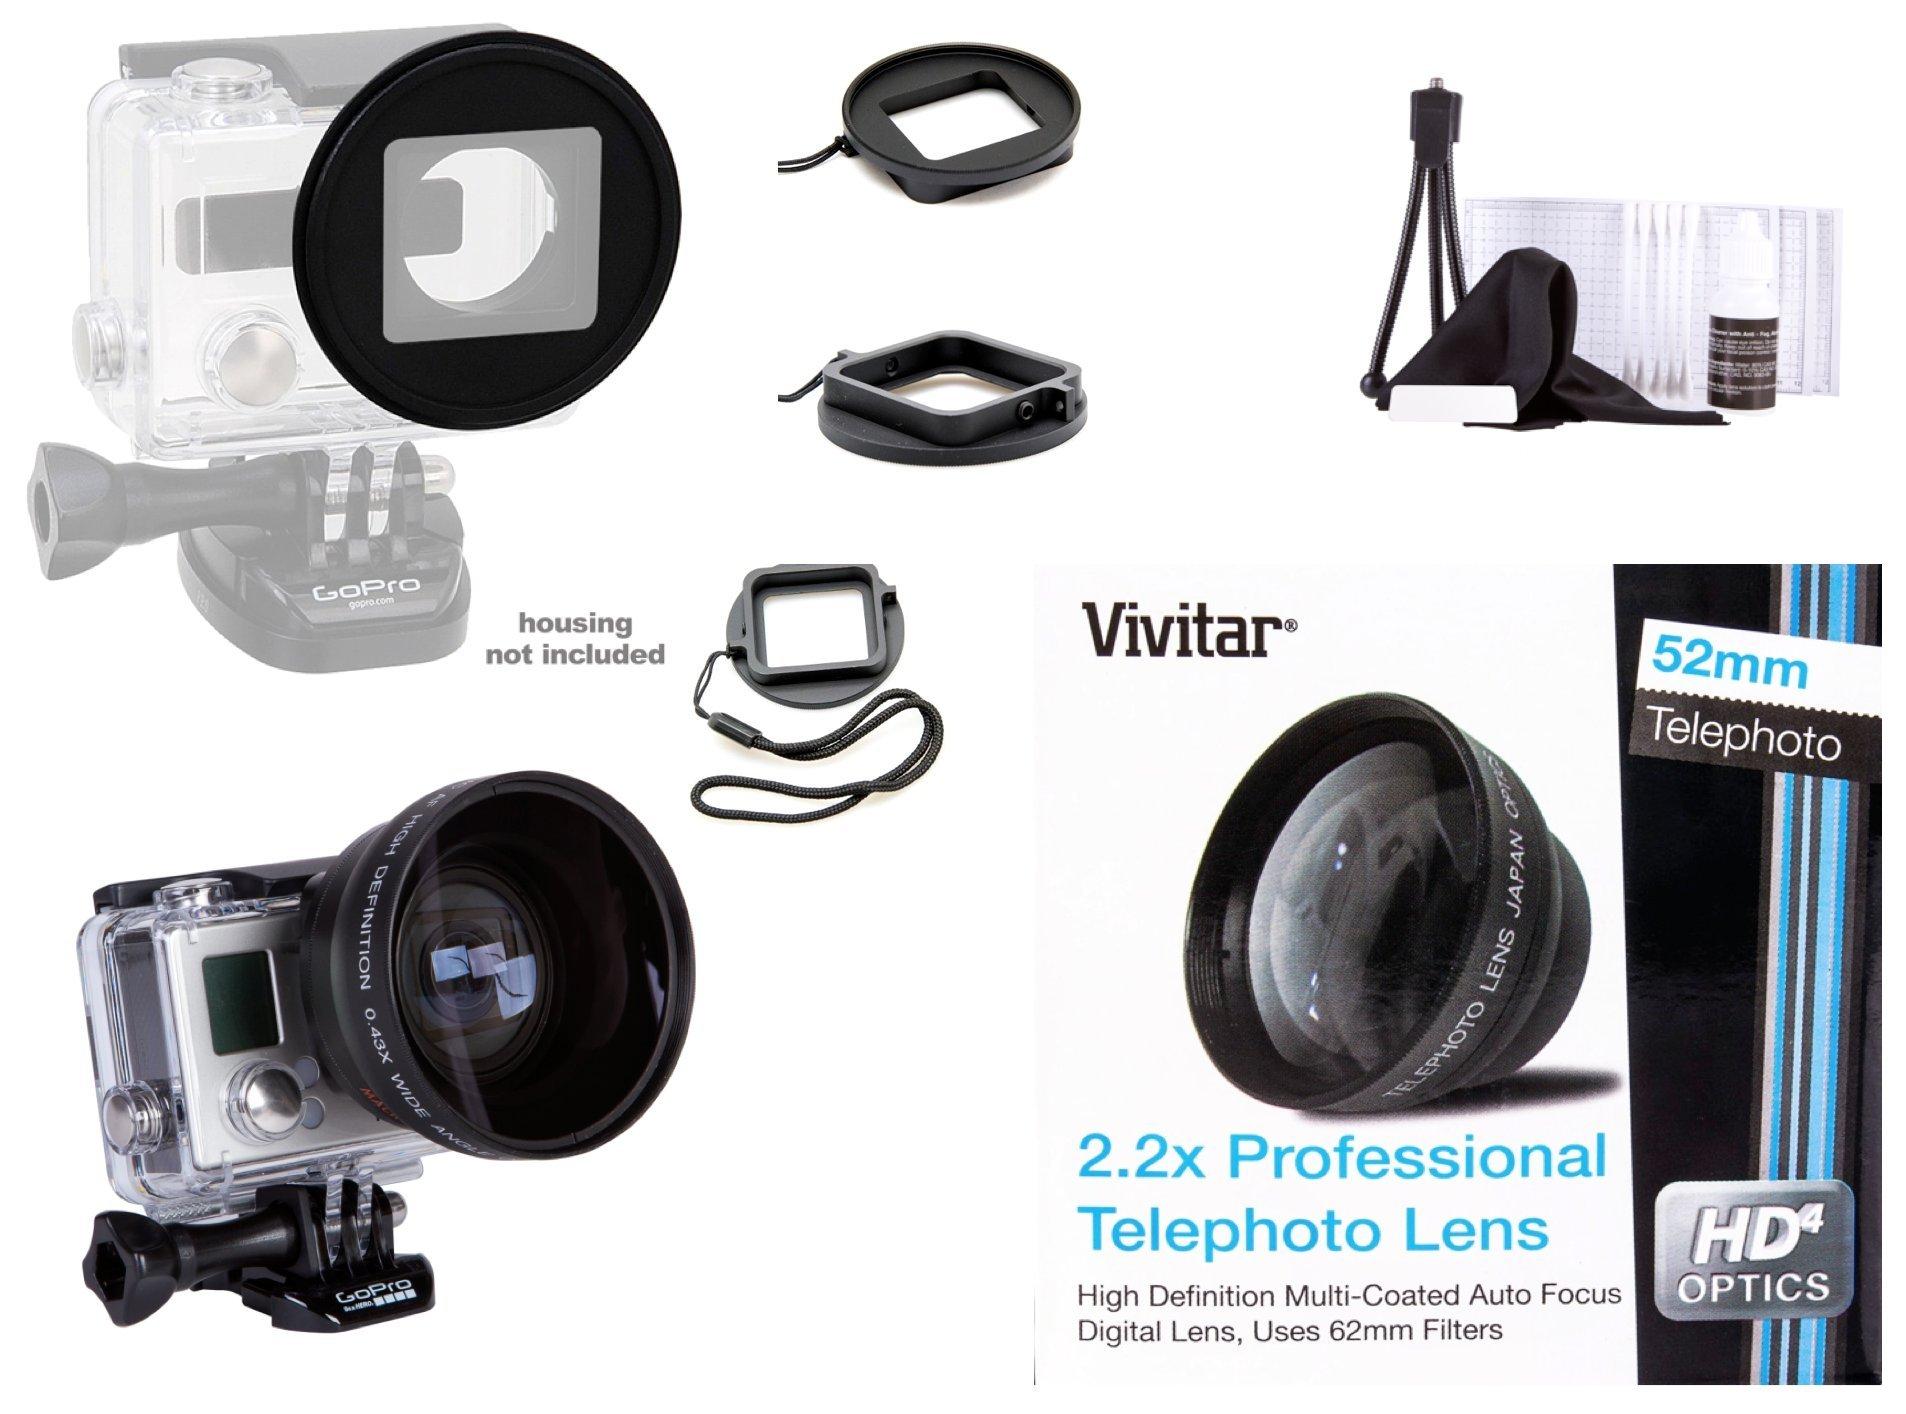 Vivitar 52mm Ring Filter Adapter for GoPro HERO3/ HERO3+/ HERO4 + 52mm Vivitar Professional HD 2.2x Telephoto Lens (MPN: V-52T) by Vivitar